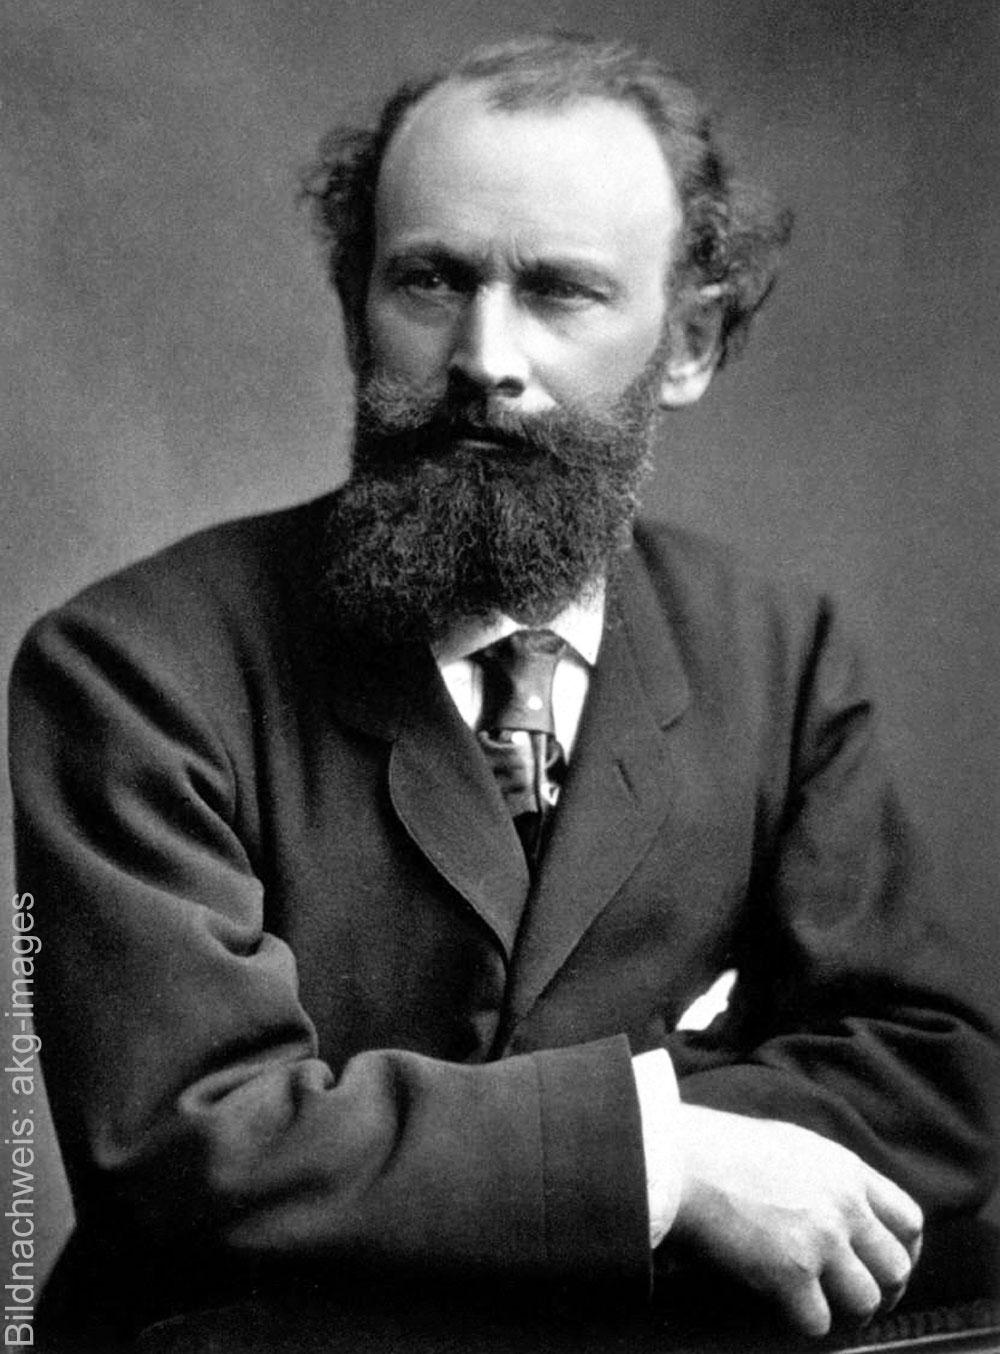 Porträt des Künstlers Edouard Manet